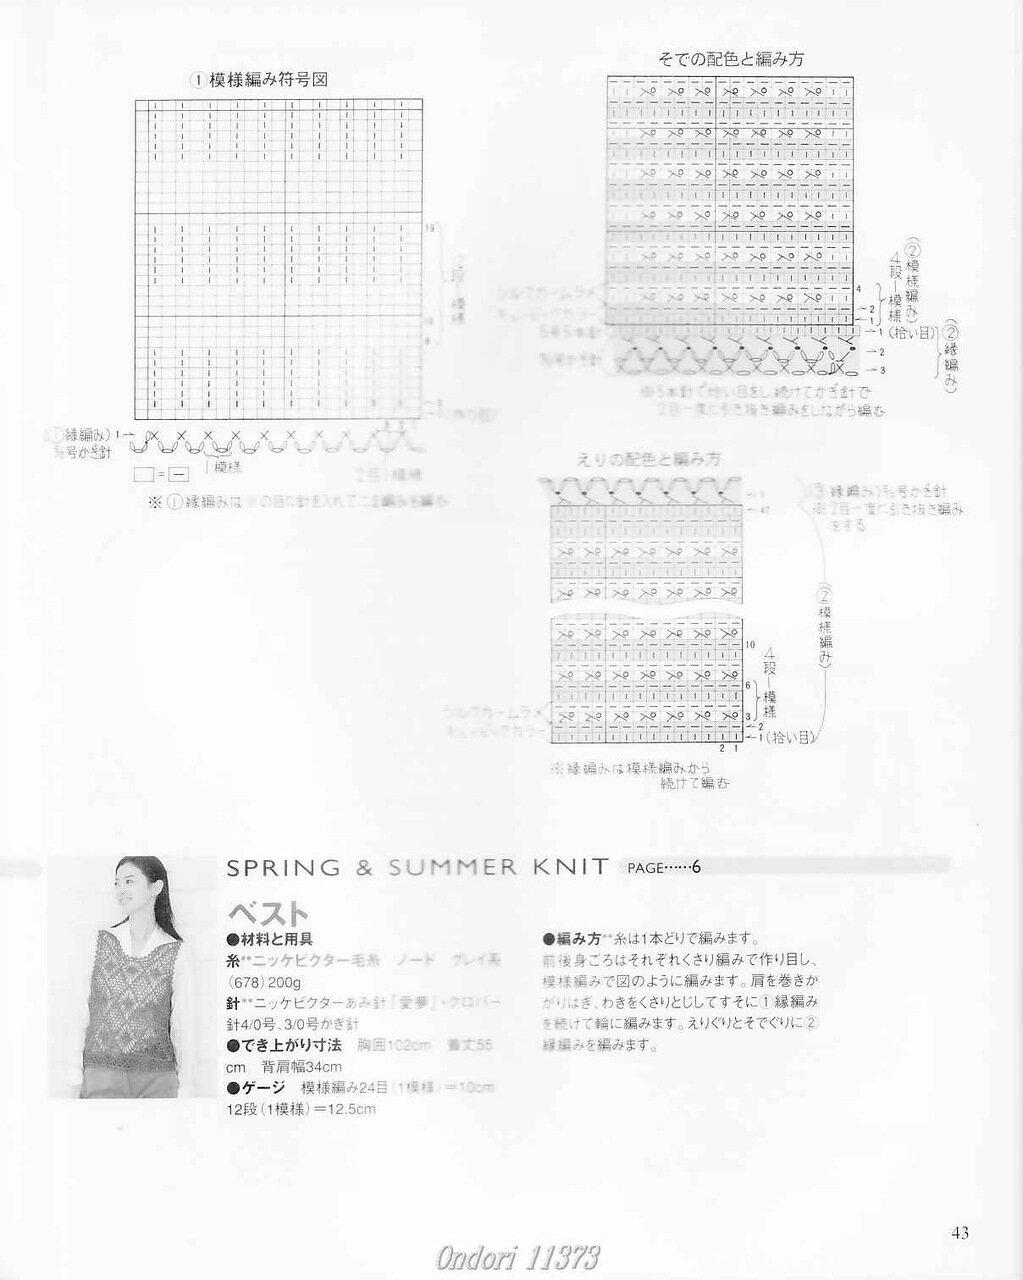 Ondori 11373 Spring Summer - 彩凤双翼 - 彩凤双翼